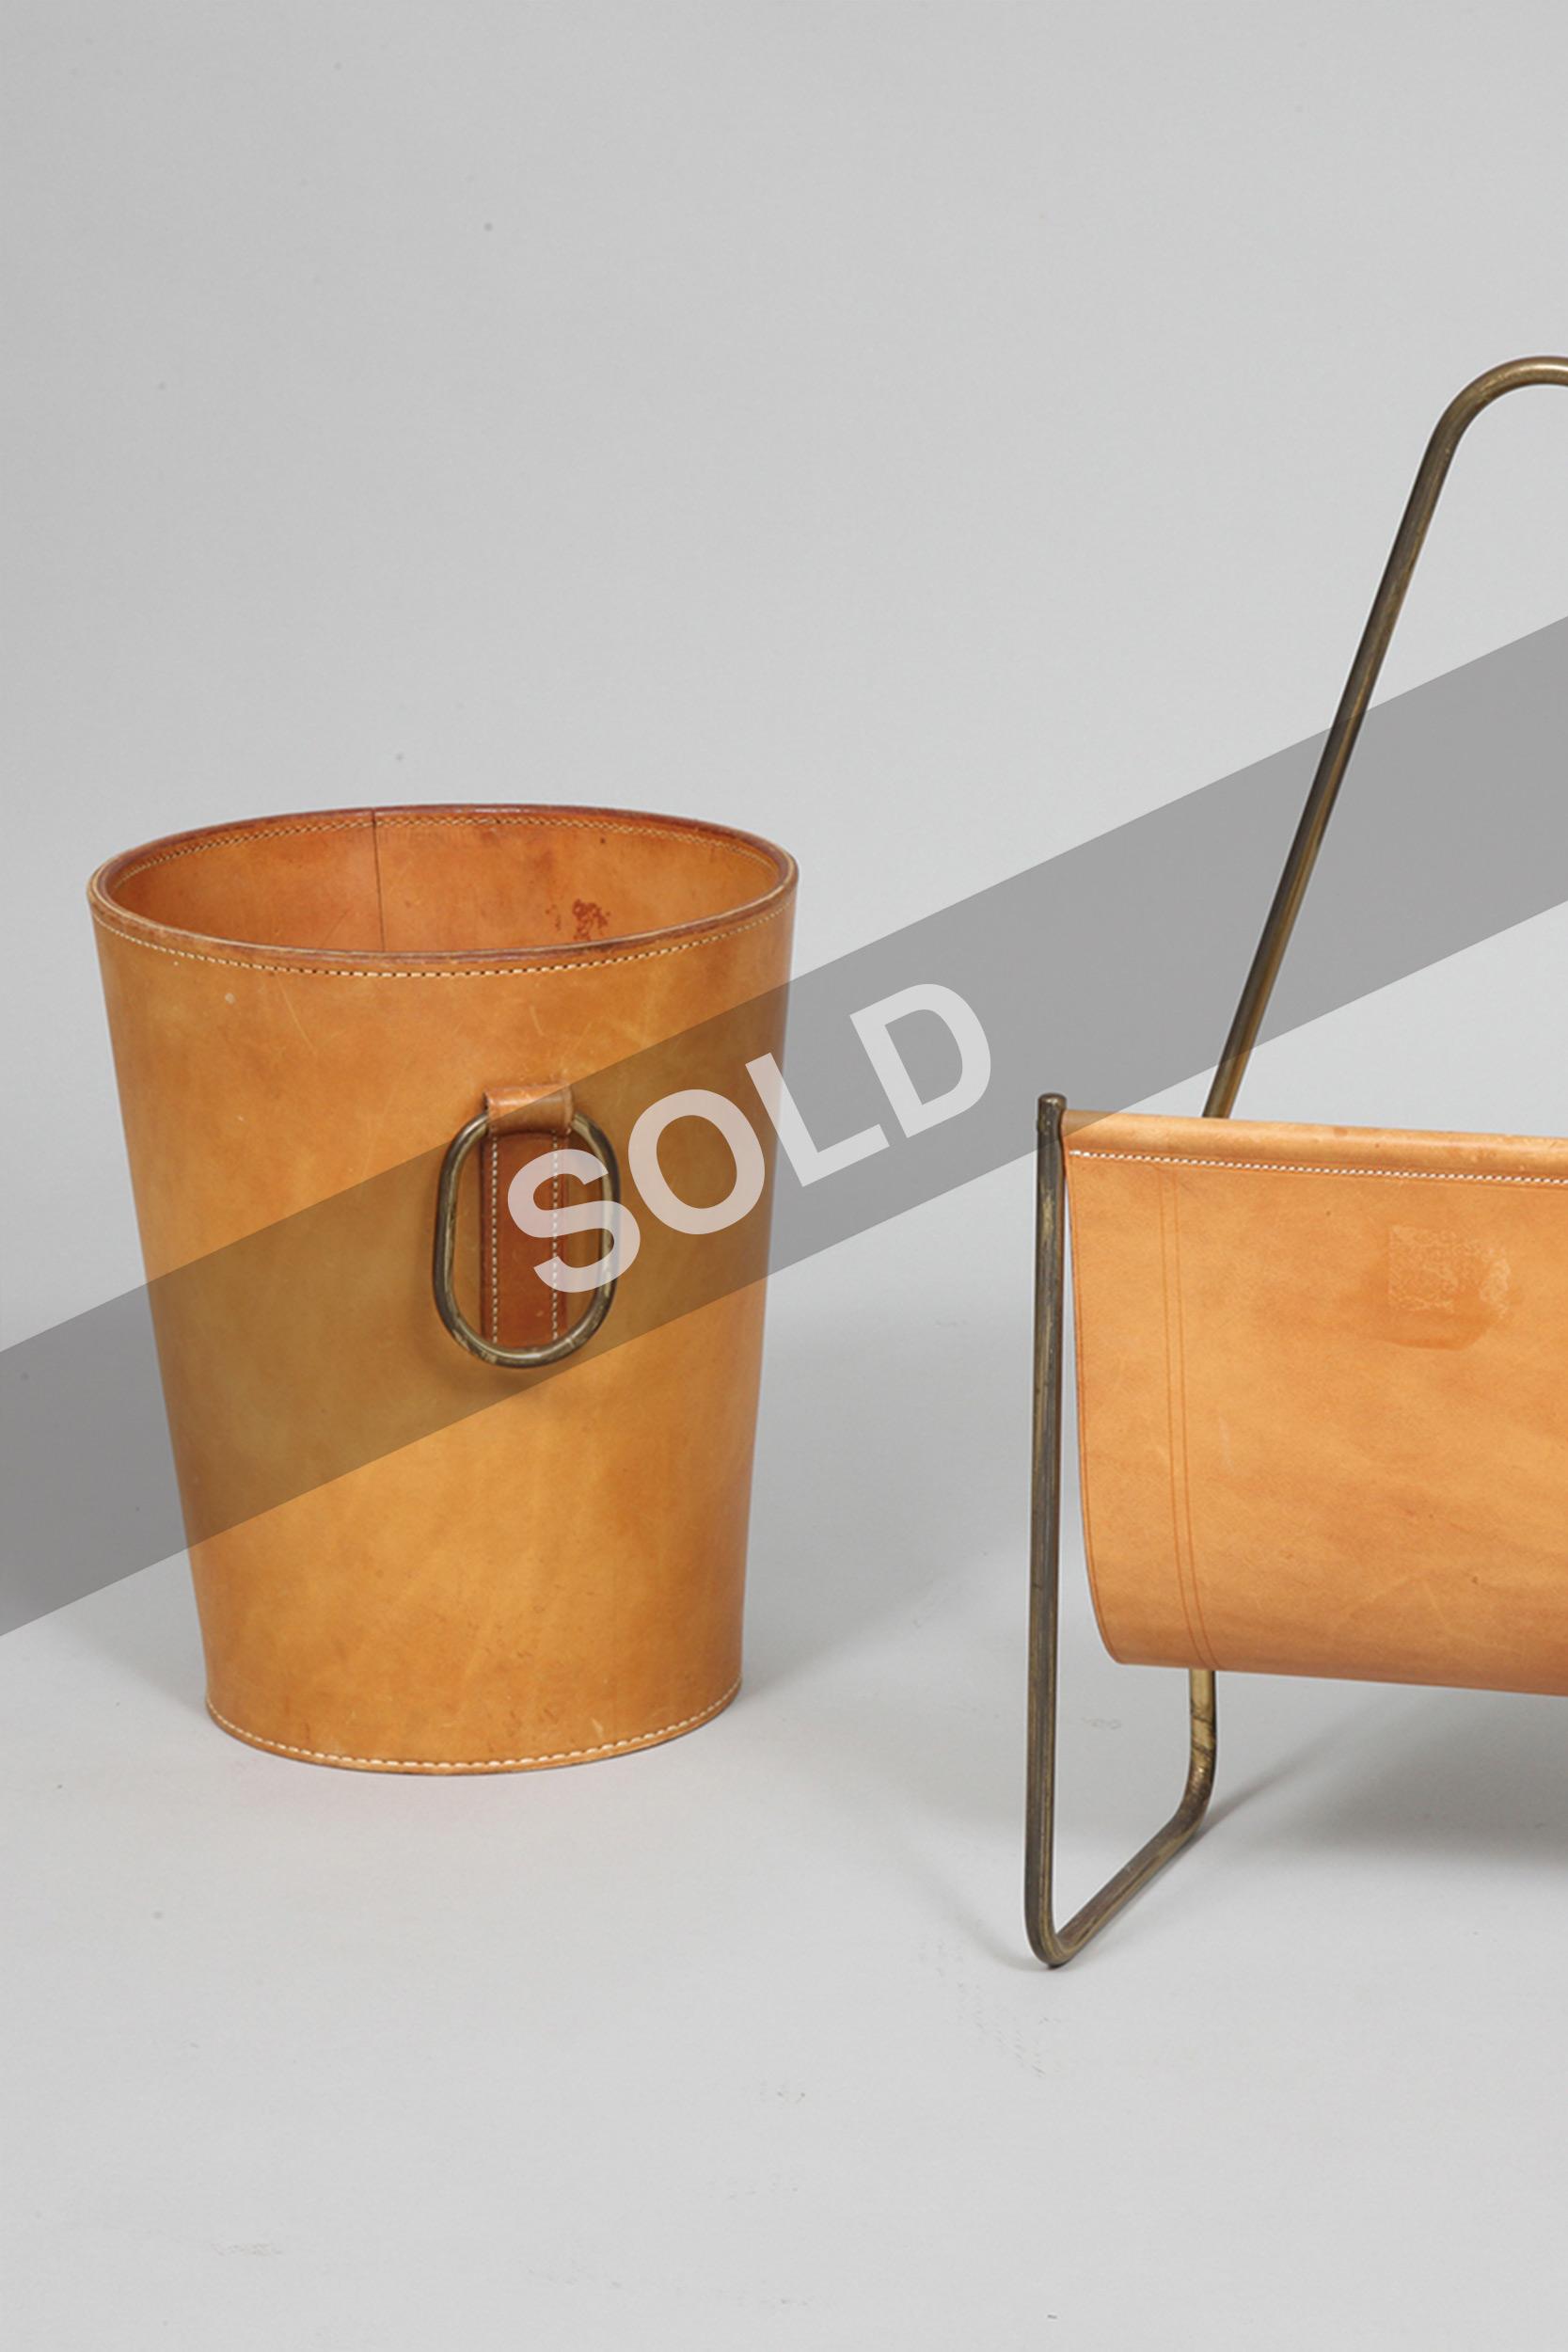 Carl Aubock waste bin and magazine rack (sold)